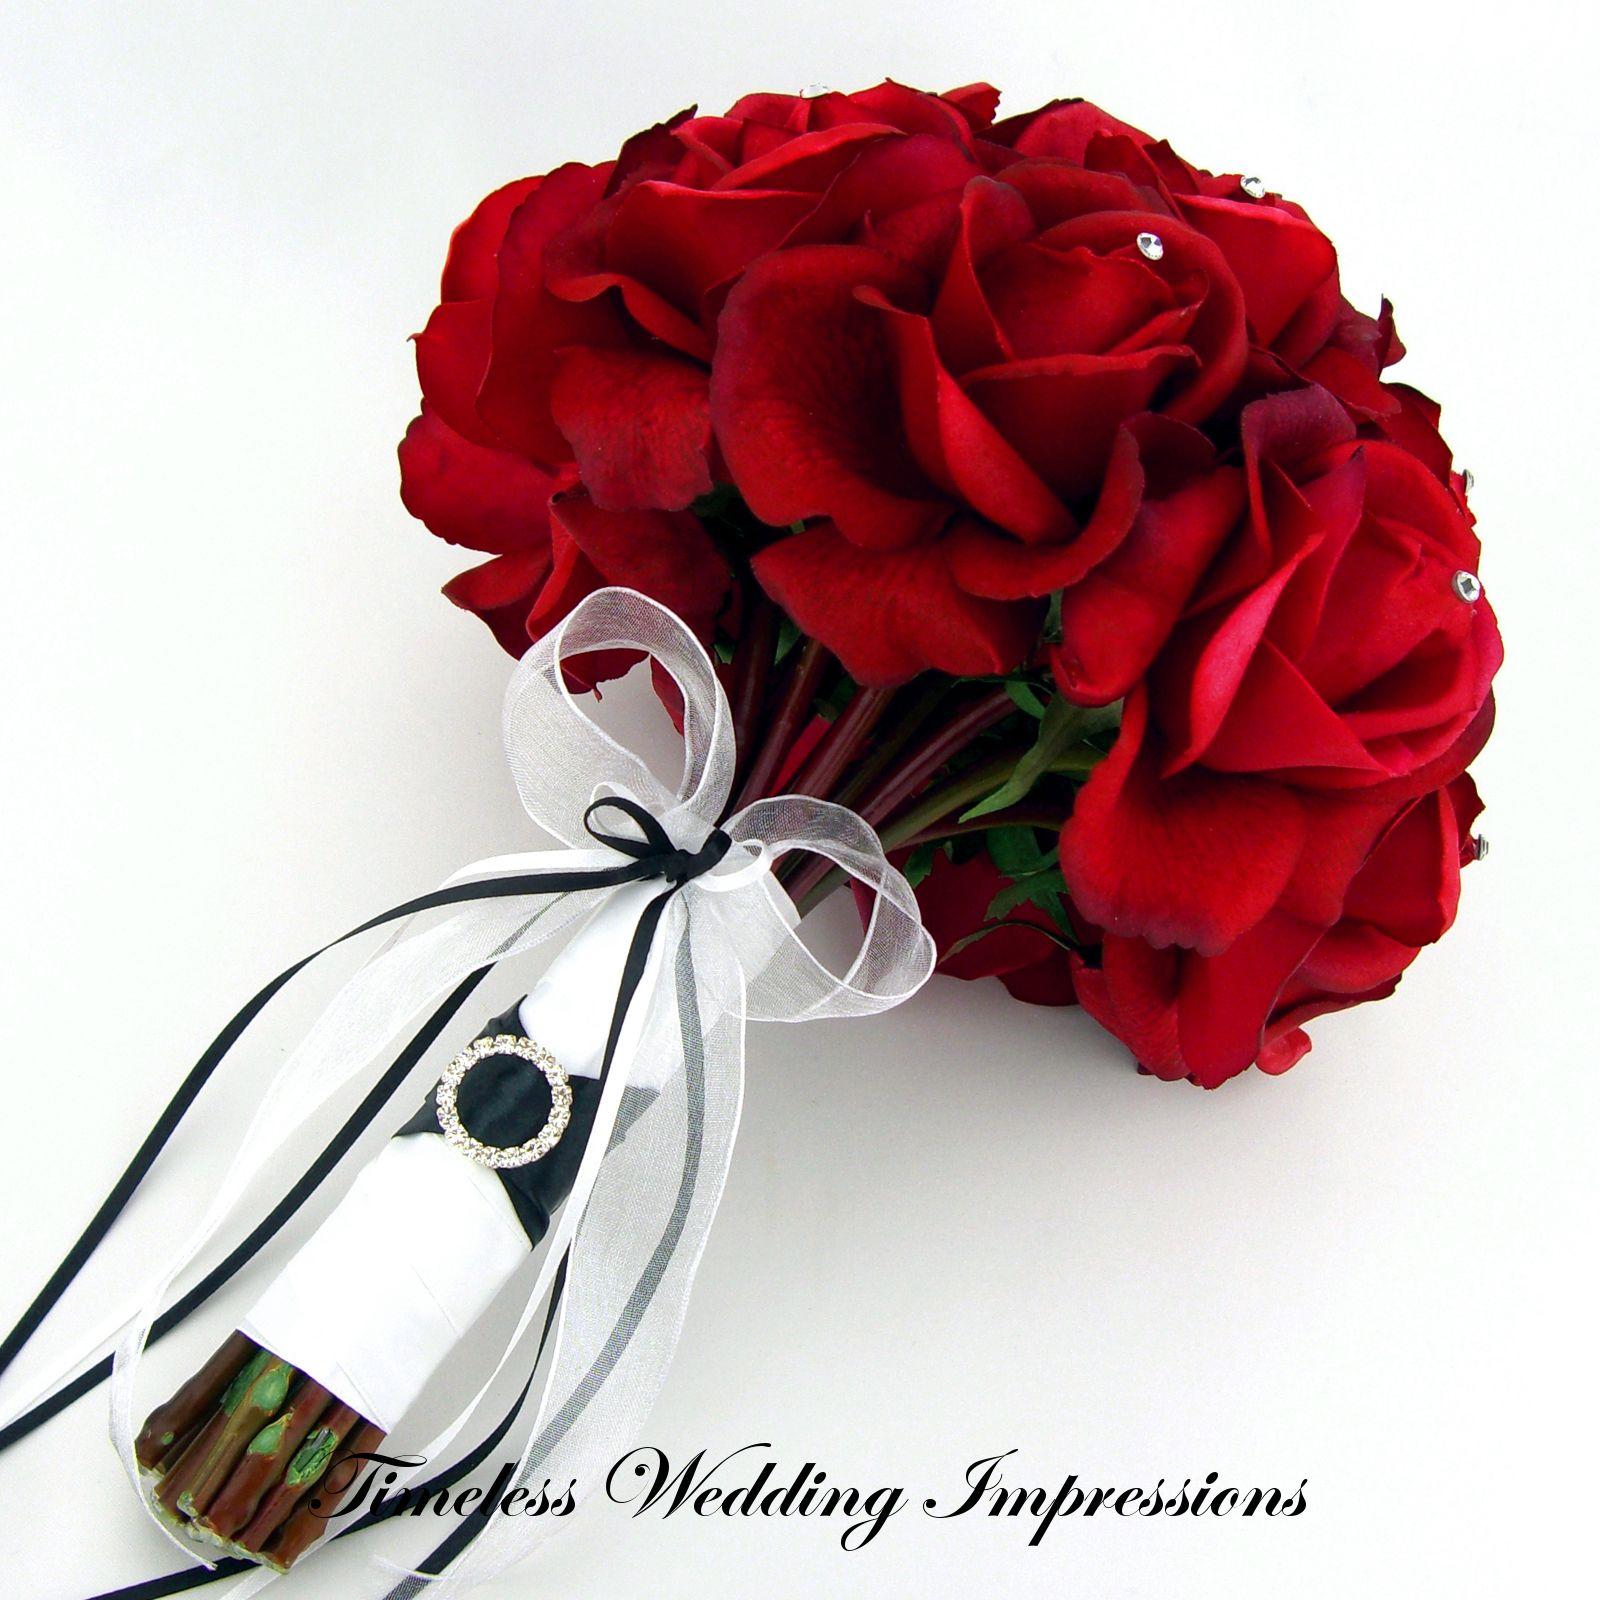 Elegant Red Rose Flowers For Wedding 22 For Your Wedding